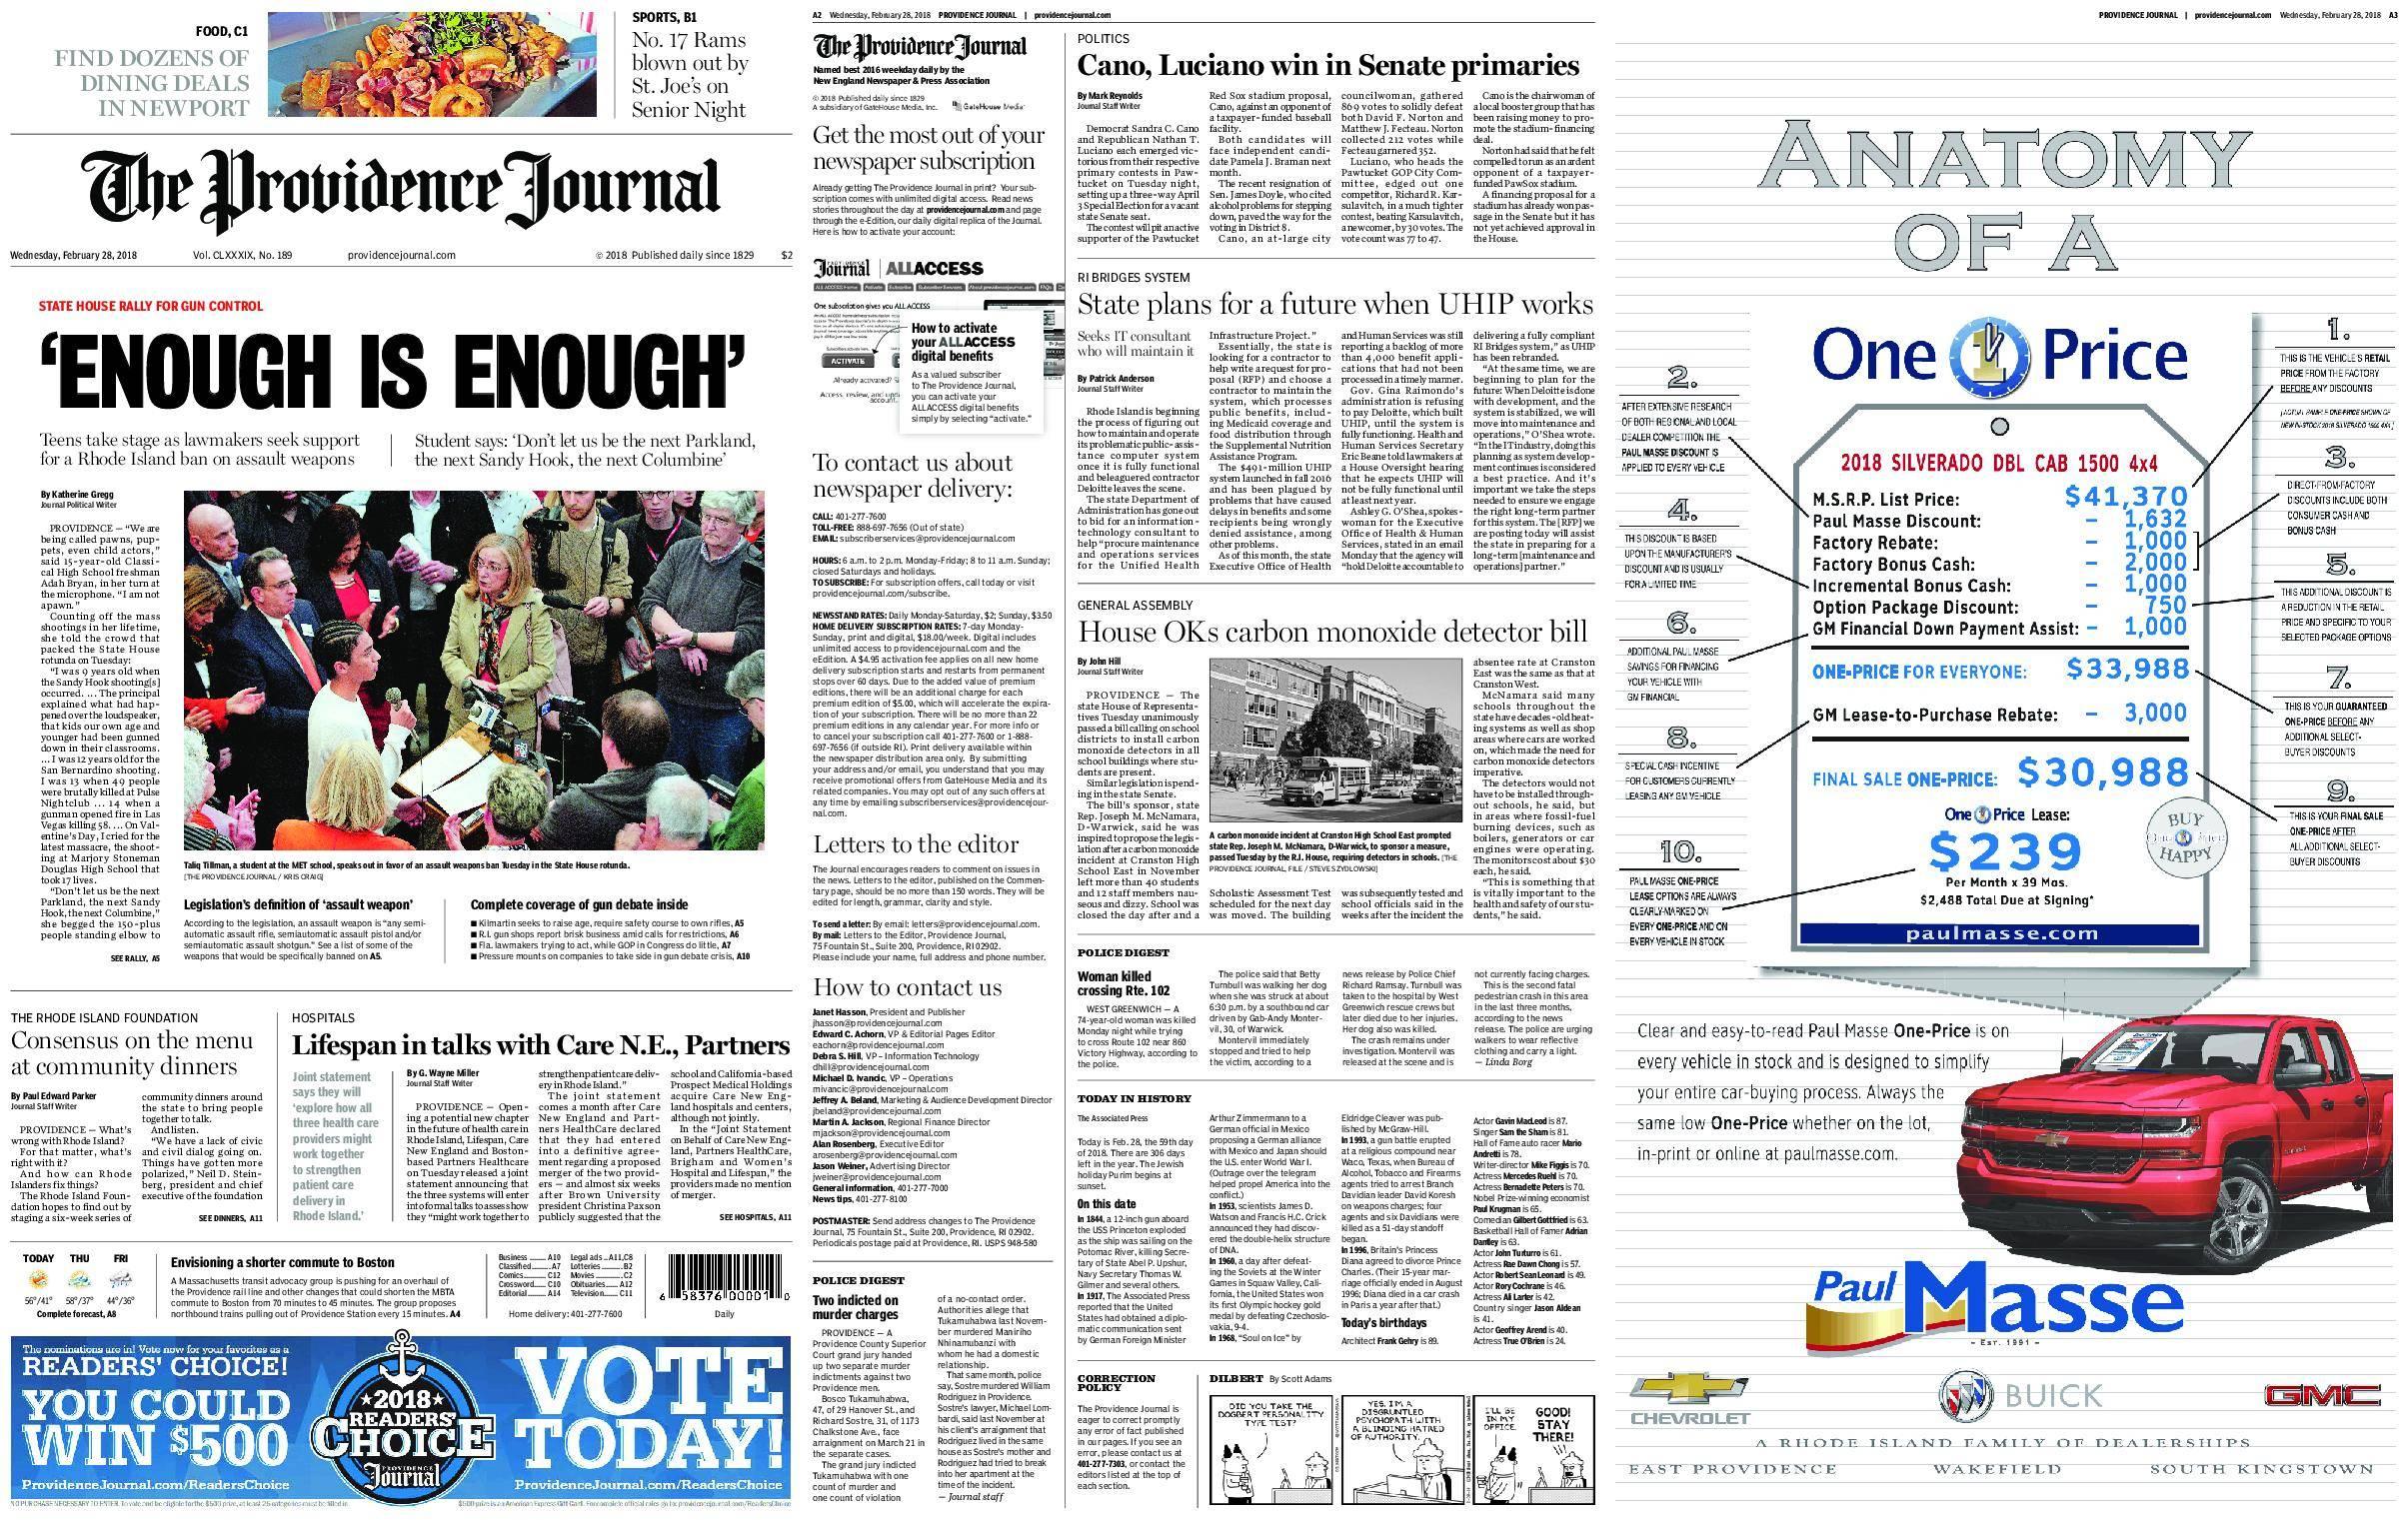 The Providence Journal – February 28, 2018 / AvaxHome